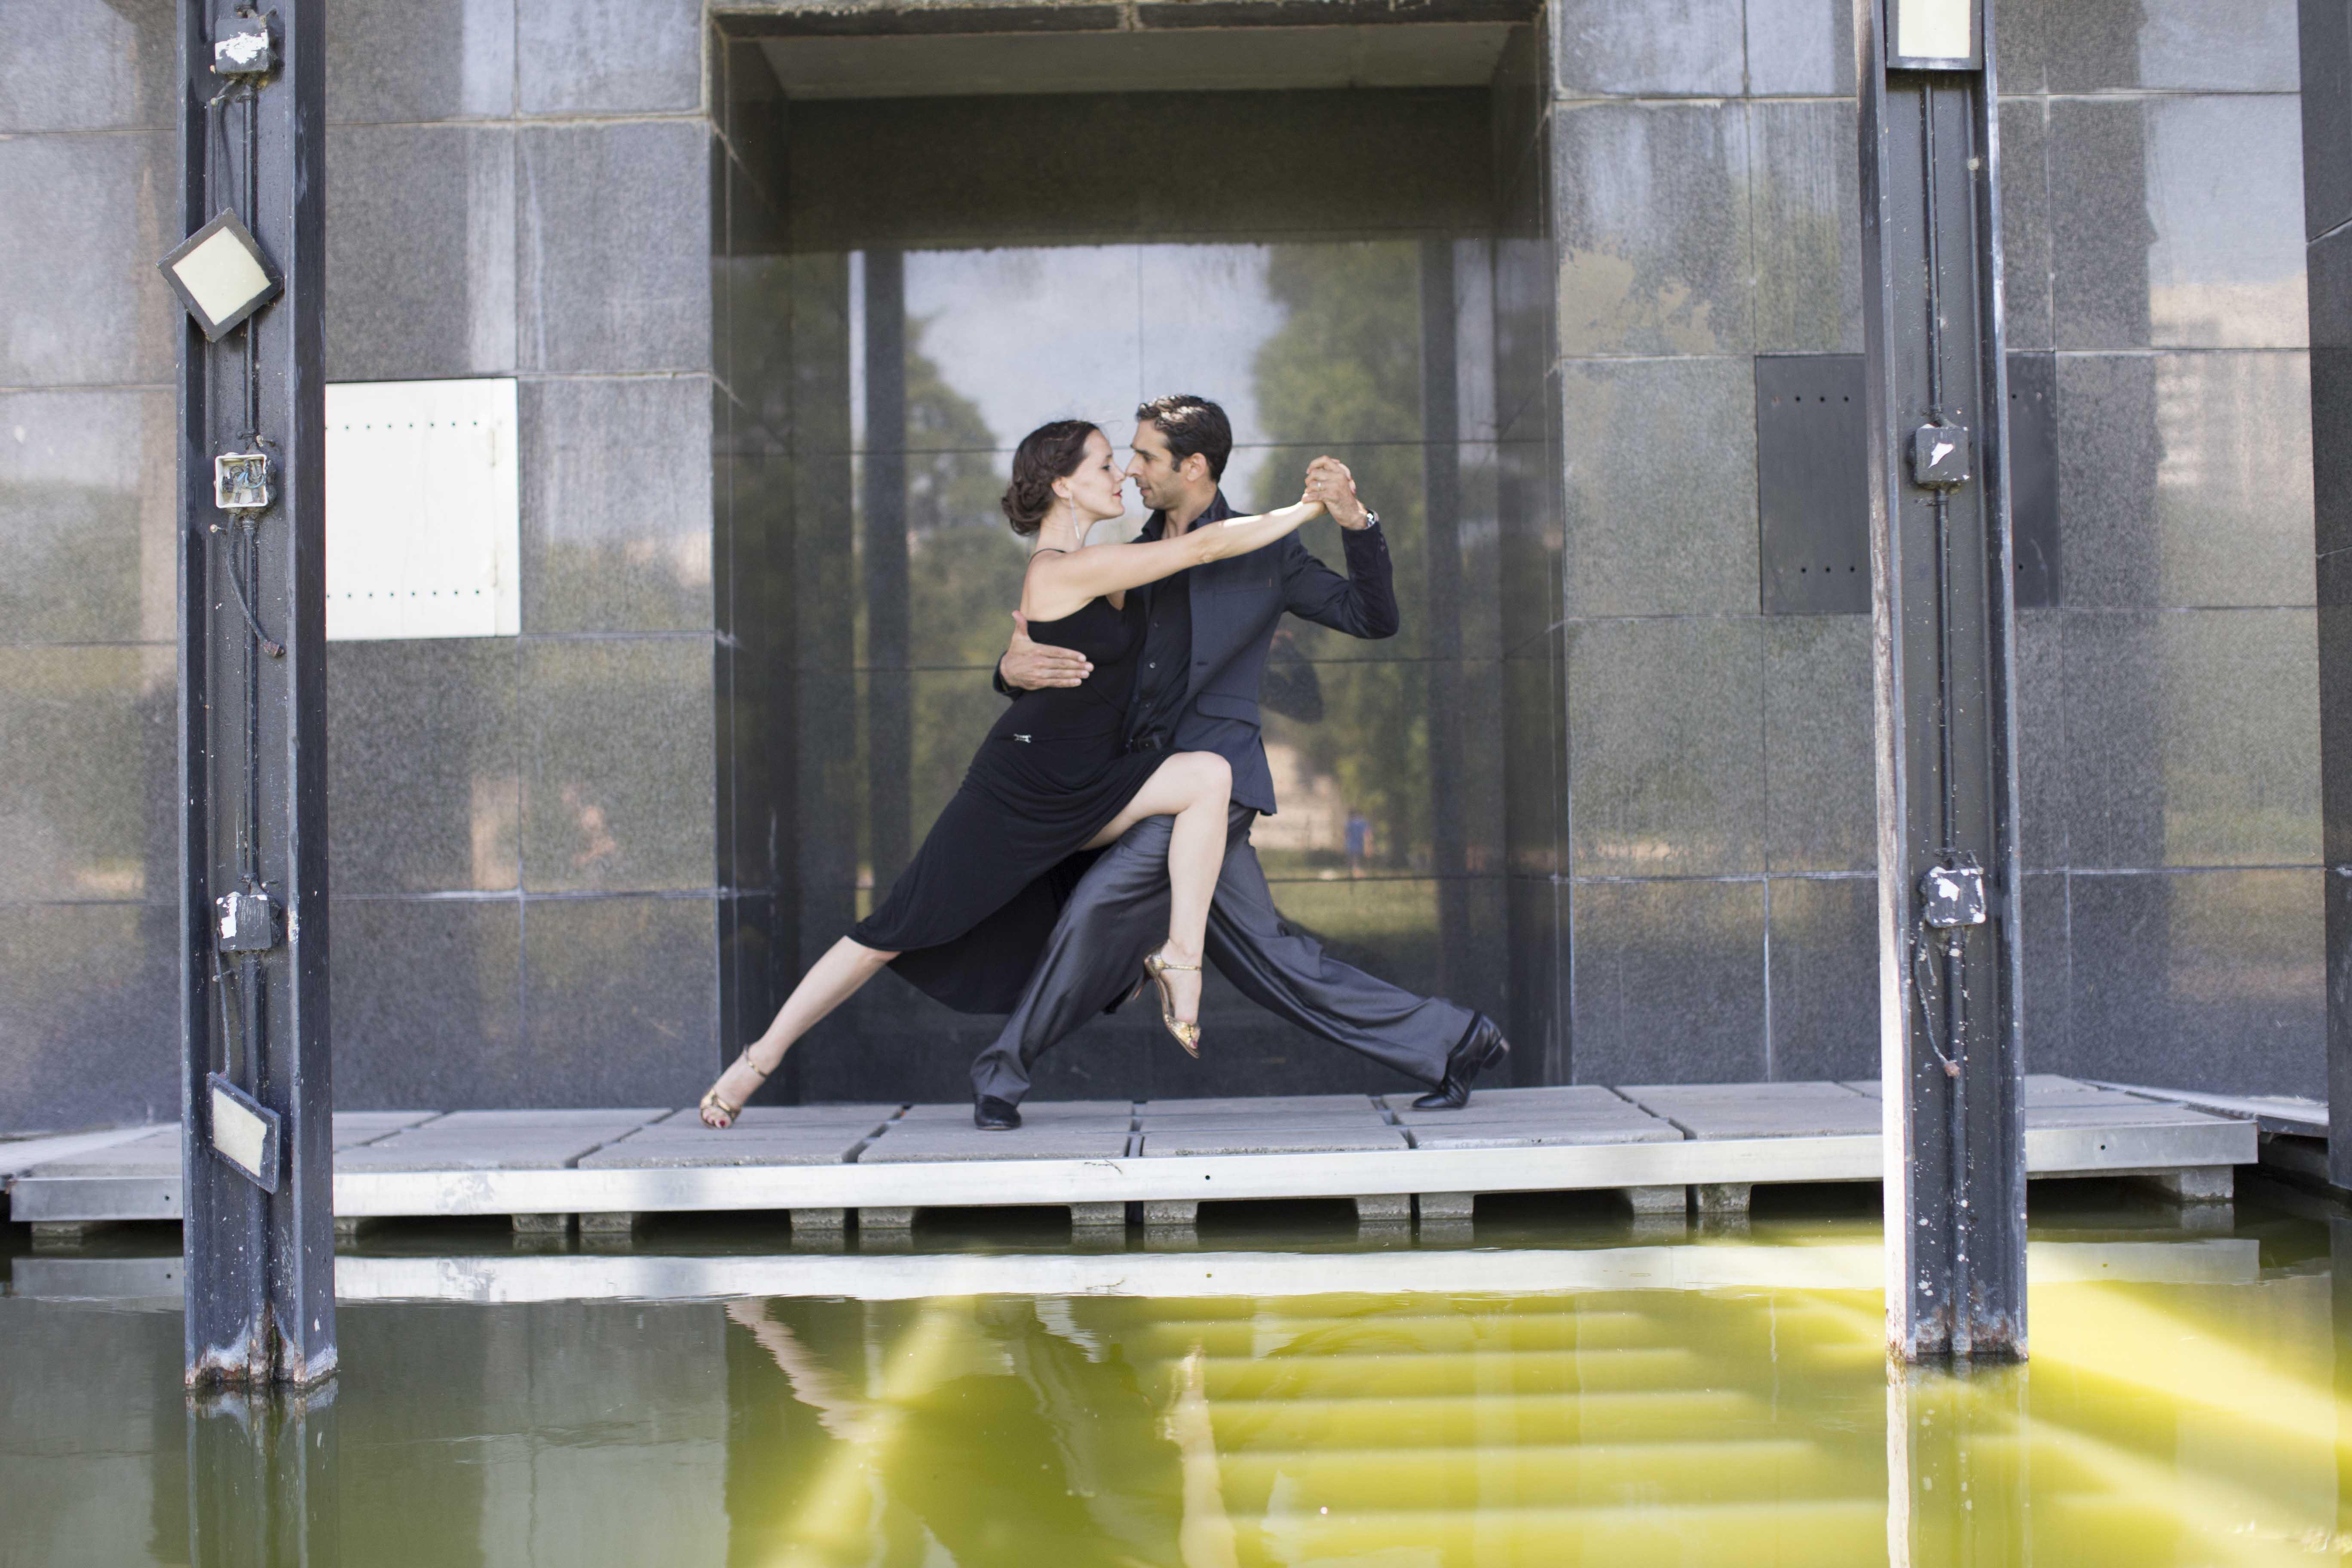 Cours de Tango - Evènementiel Tango